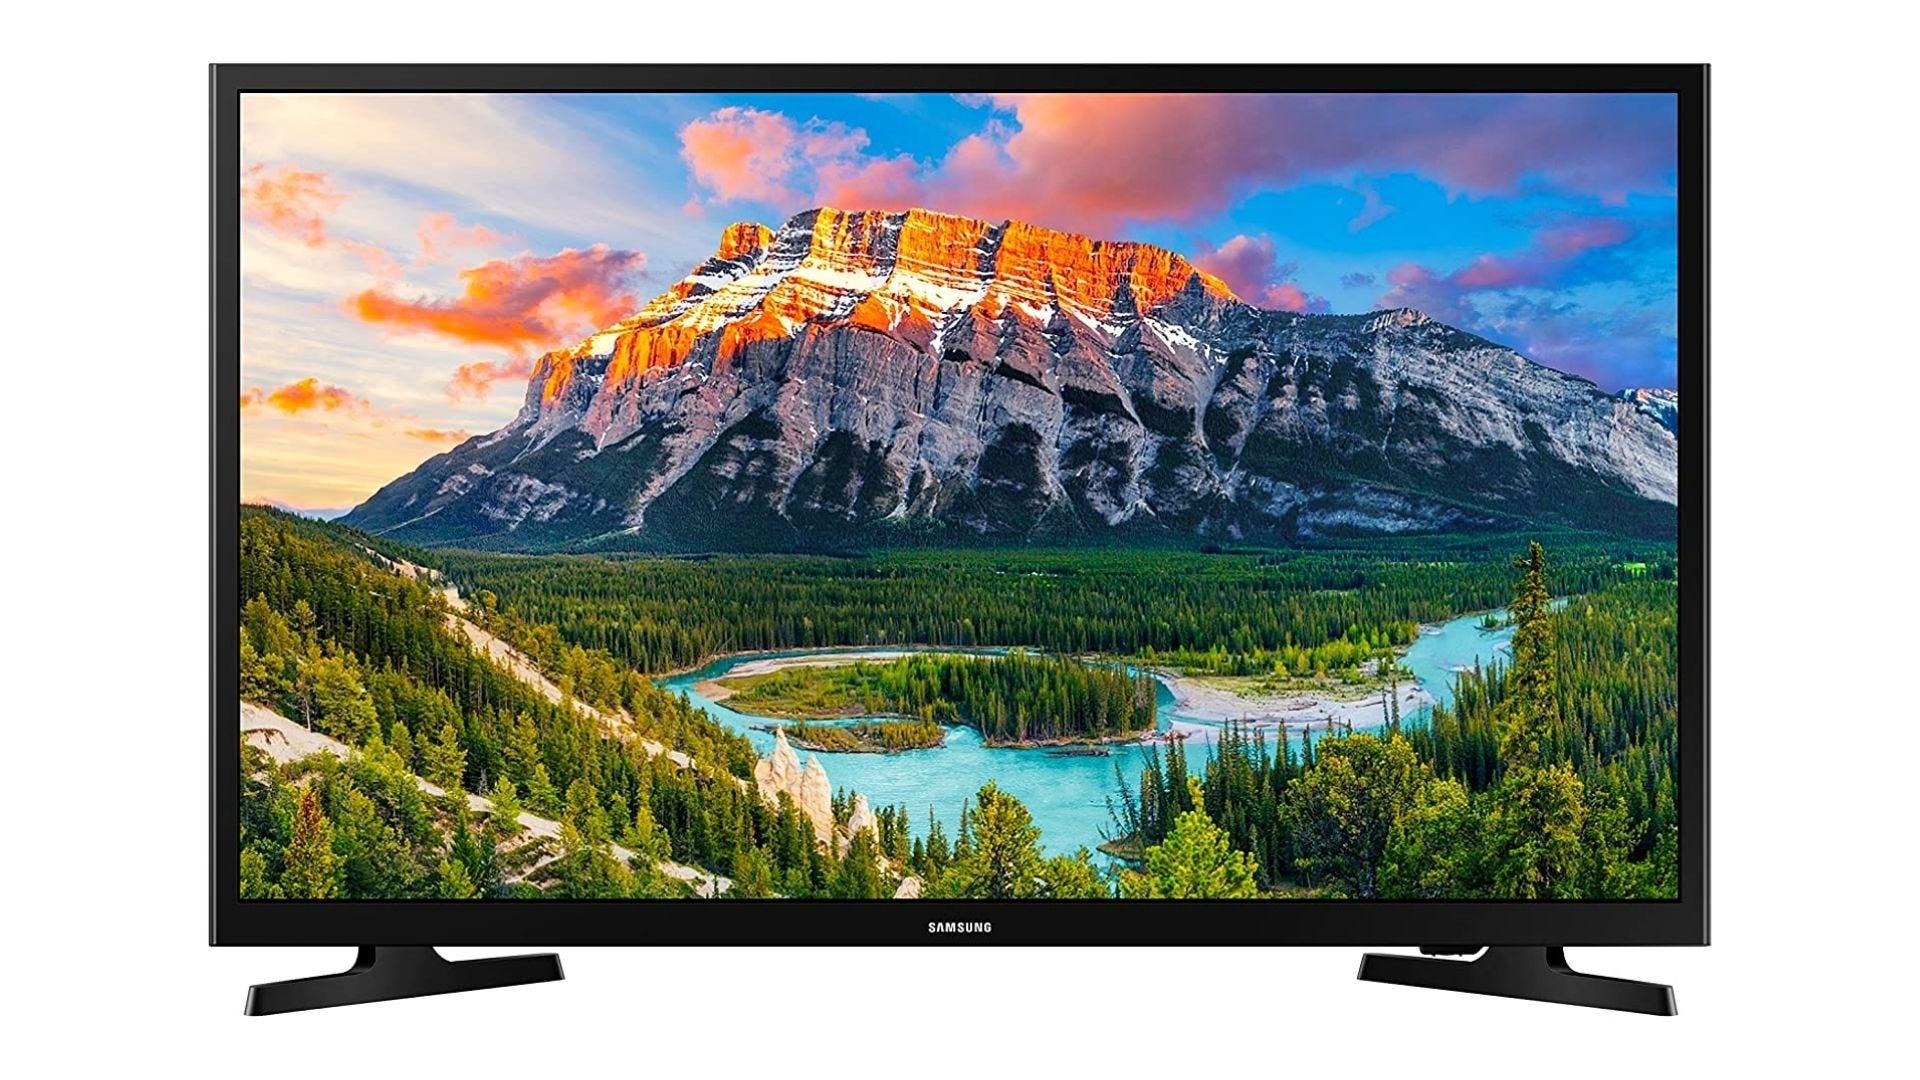 SAMSUNG 32-inch Class LED Smart FHD TV 1080P